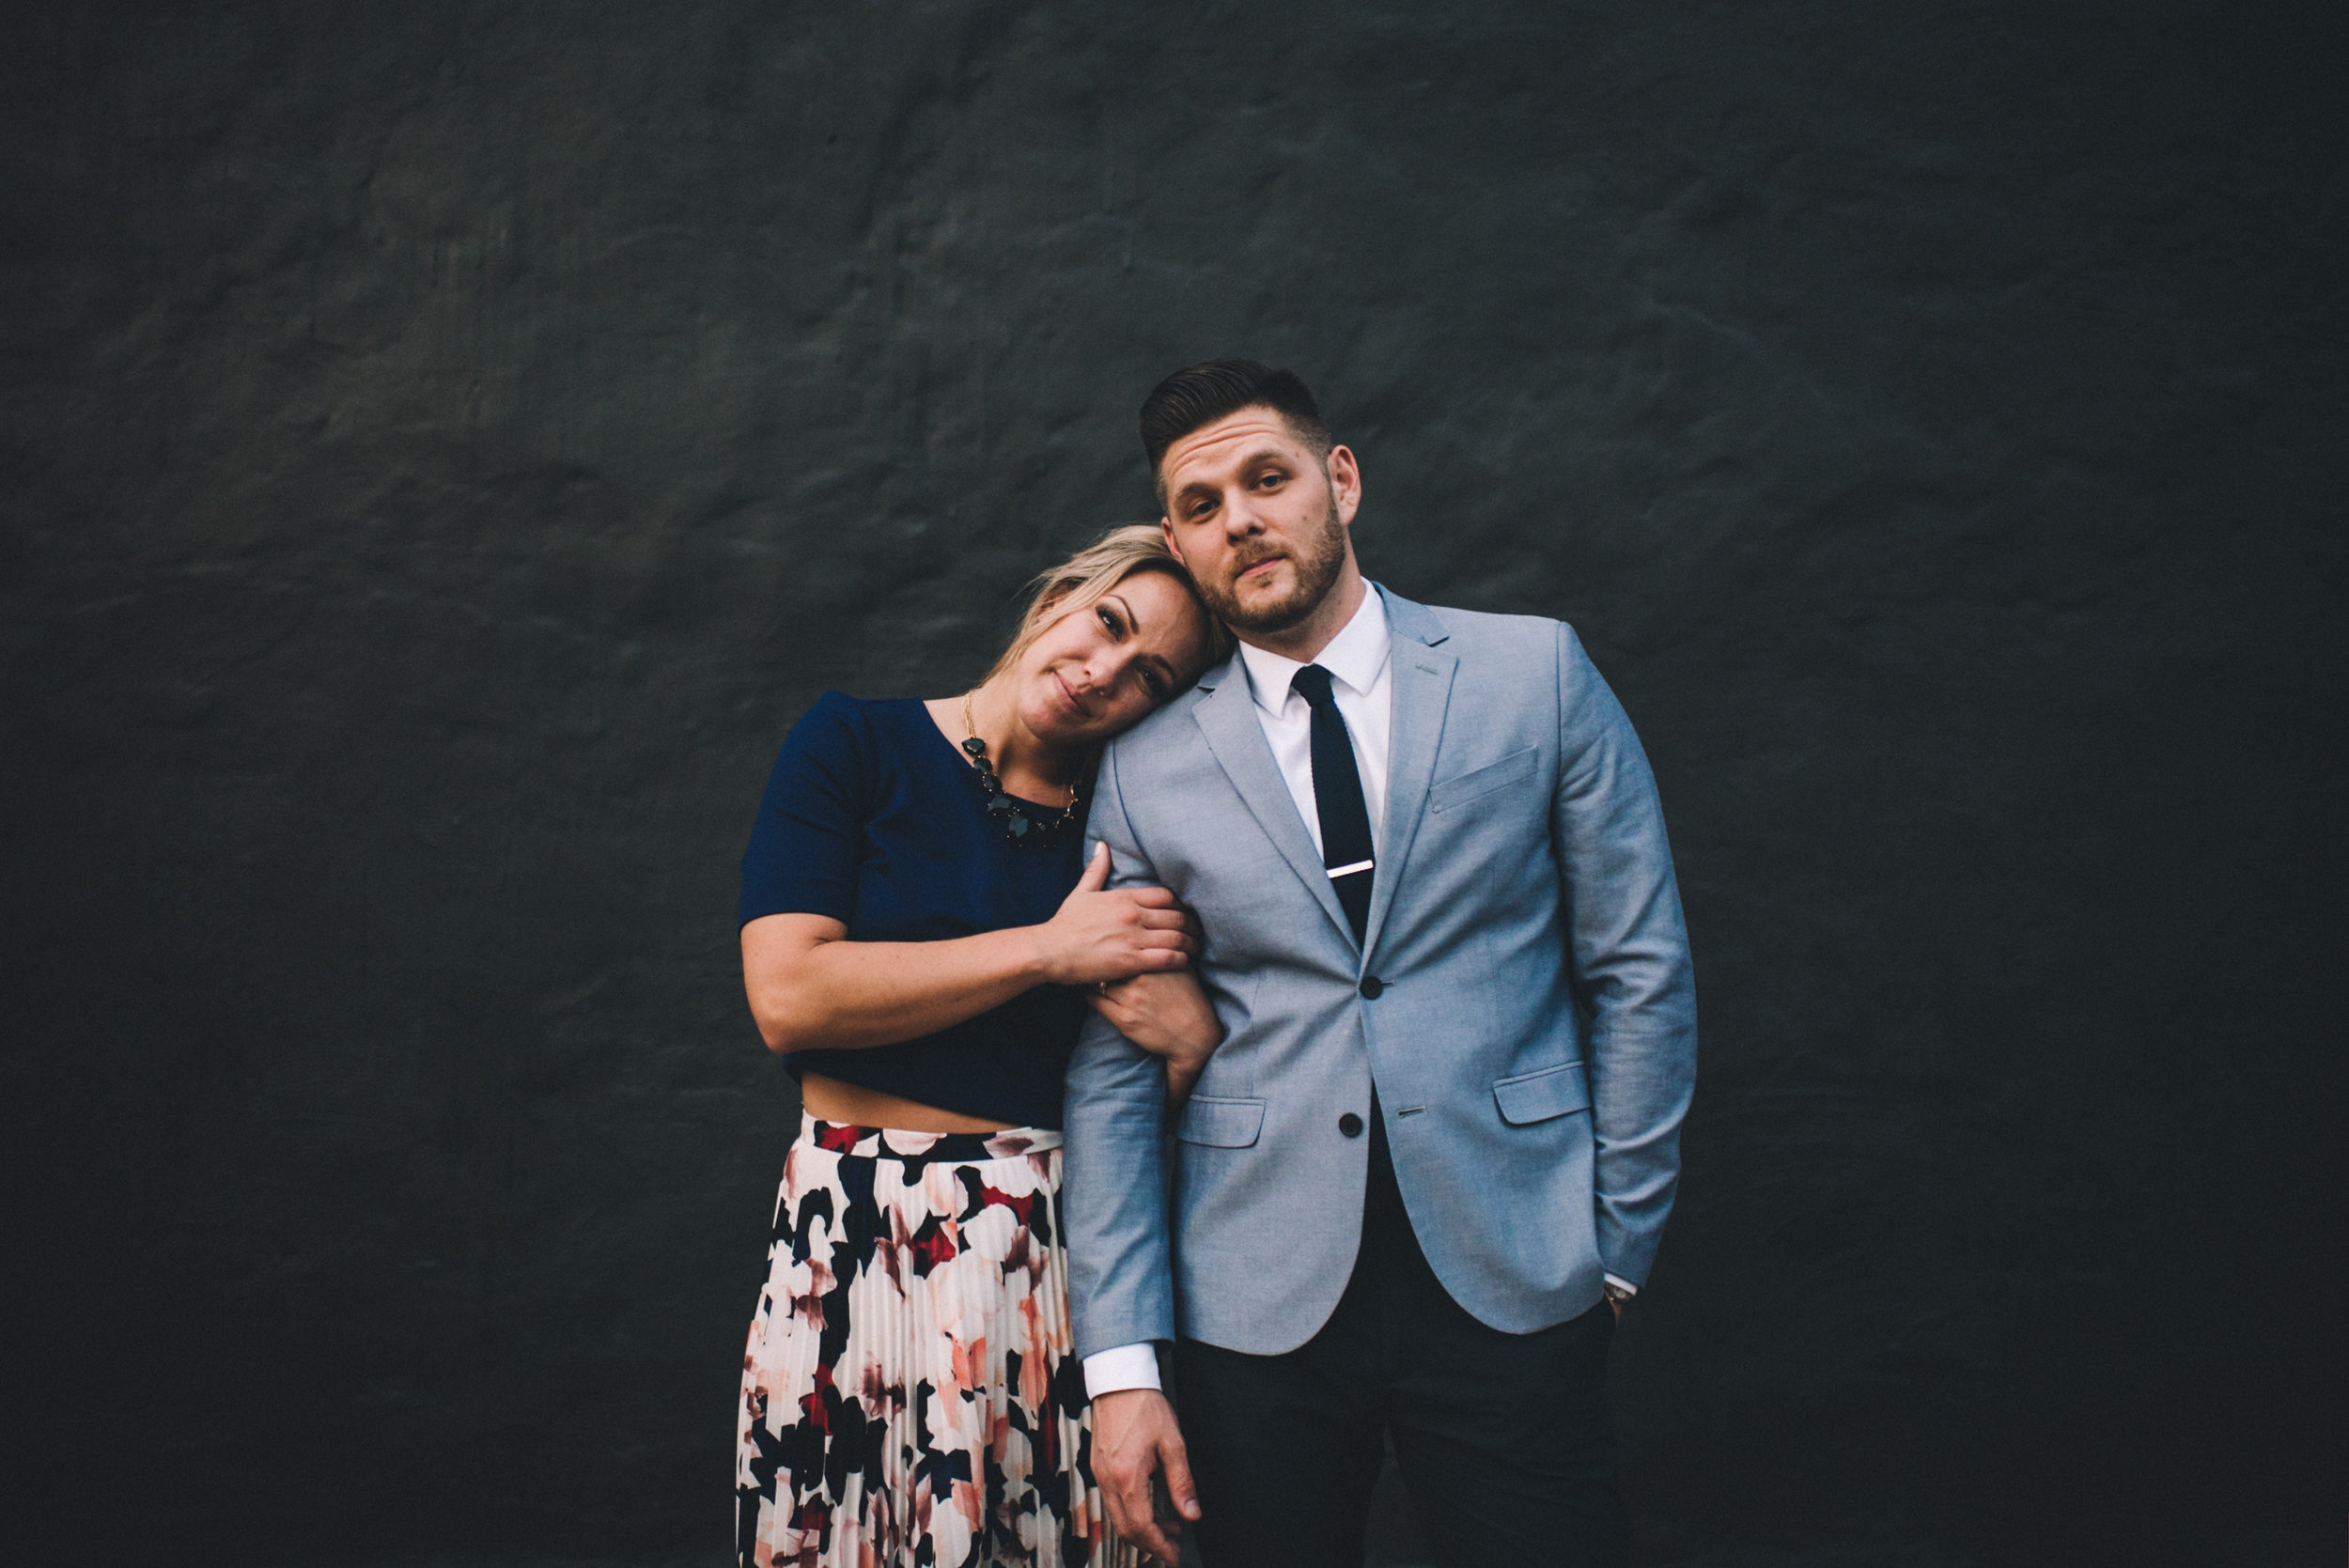 Pittsburgh Wedding Photographer - Stirpe-197.jpg